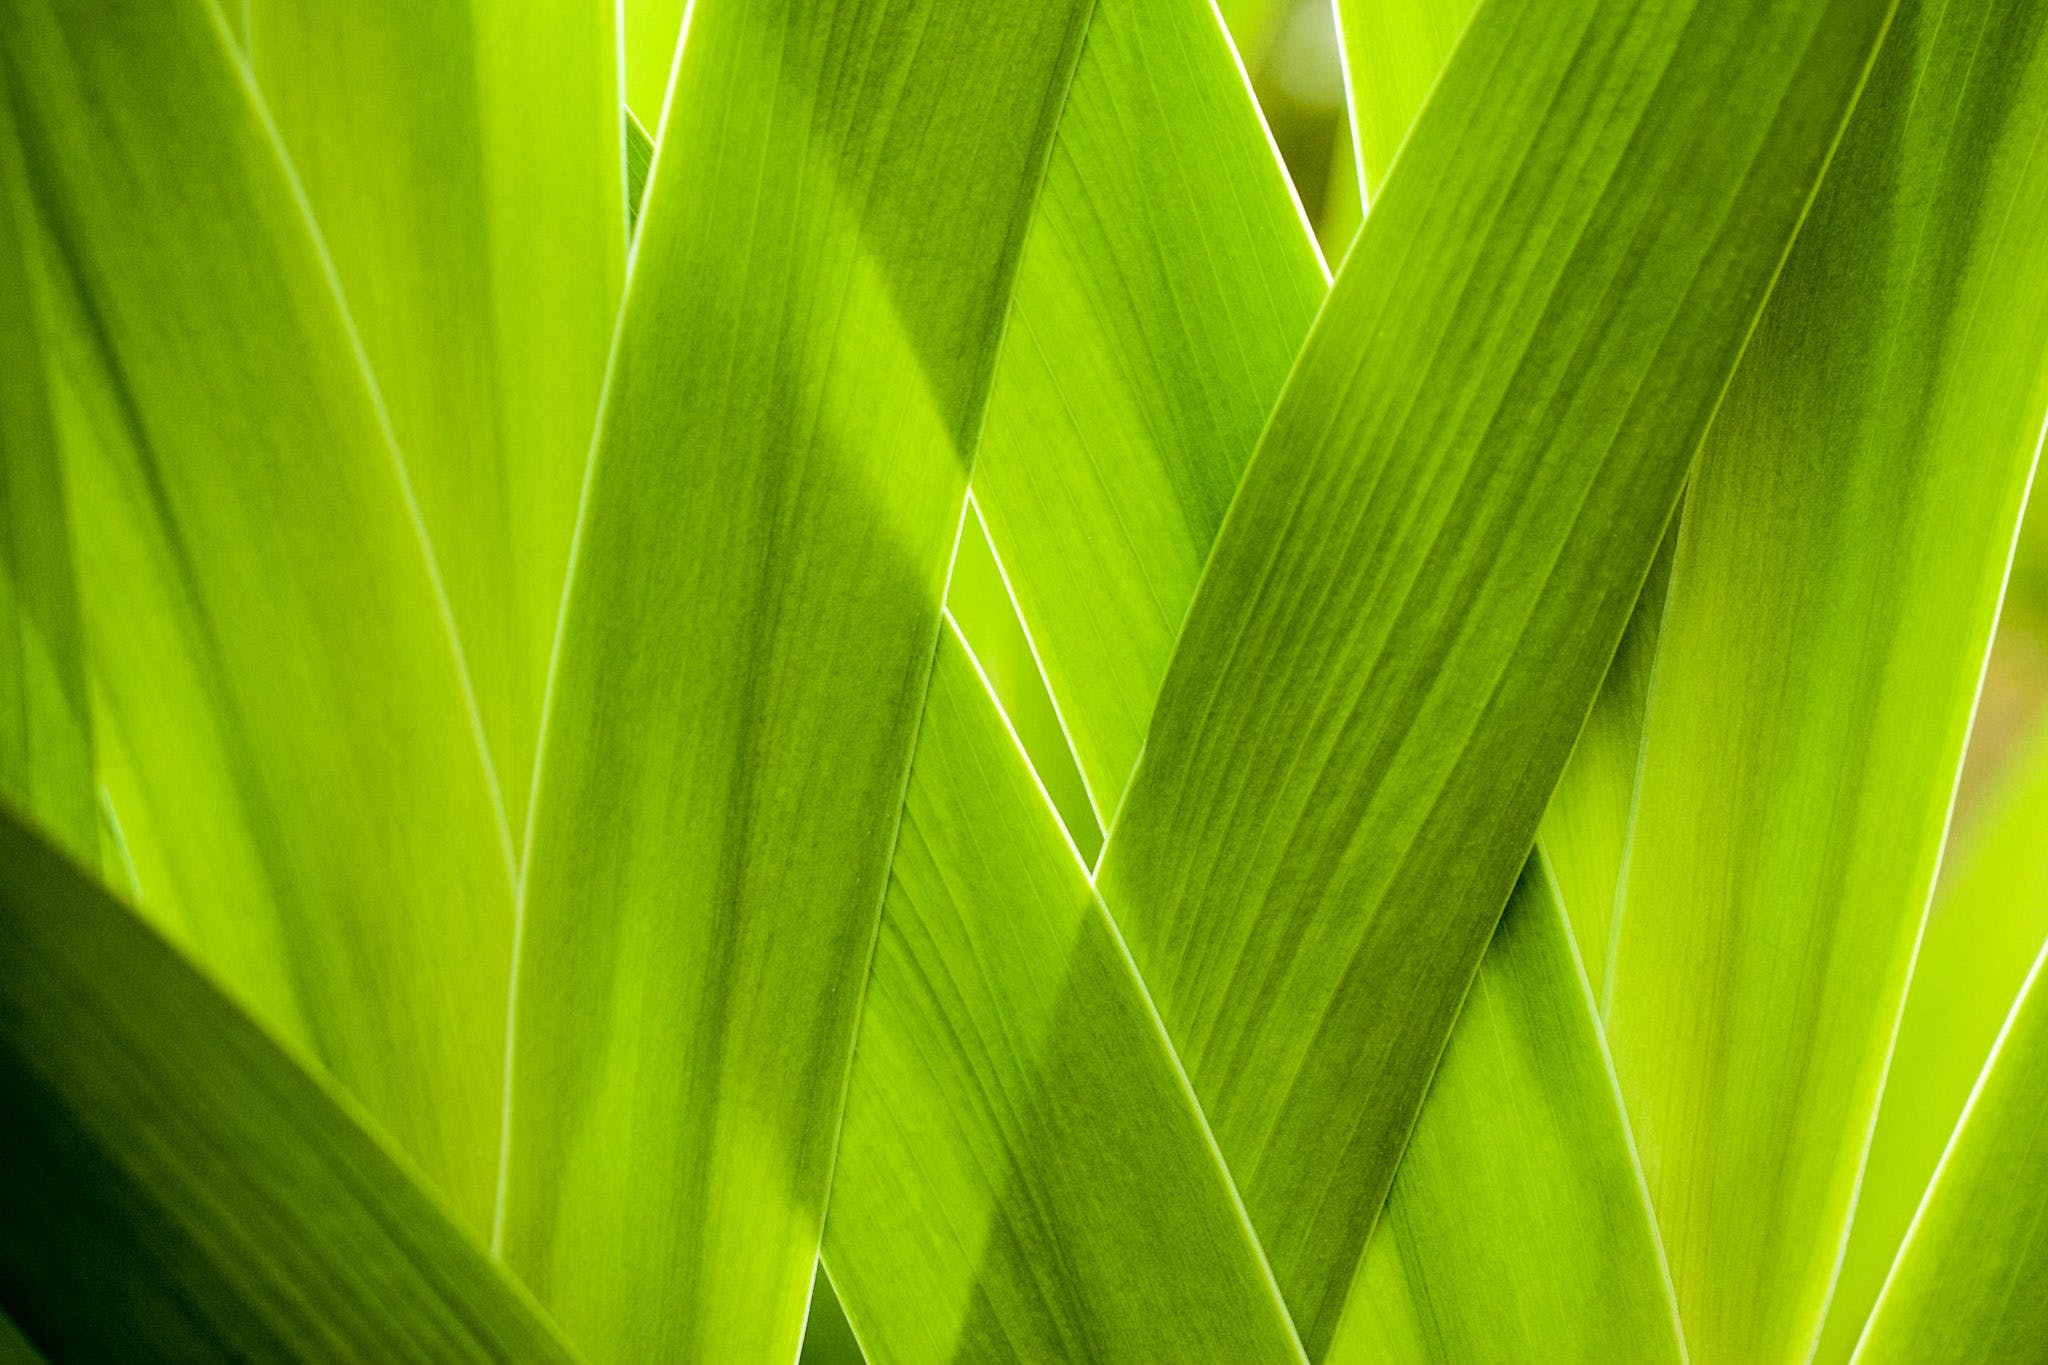 Free stock photo of nature, texture, garden, plant